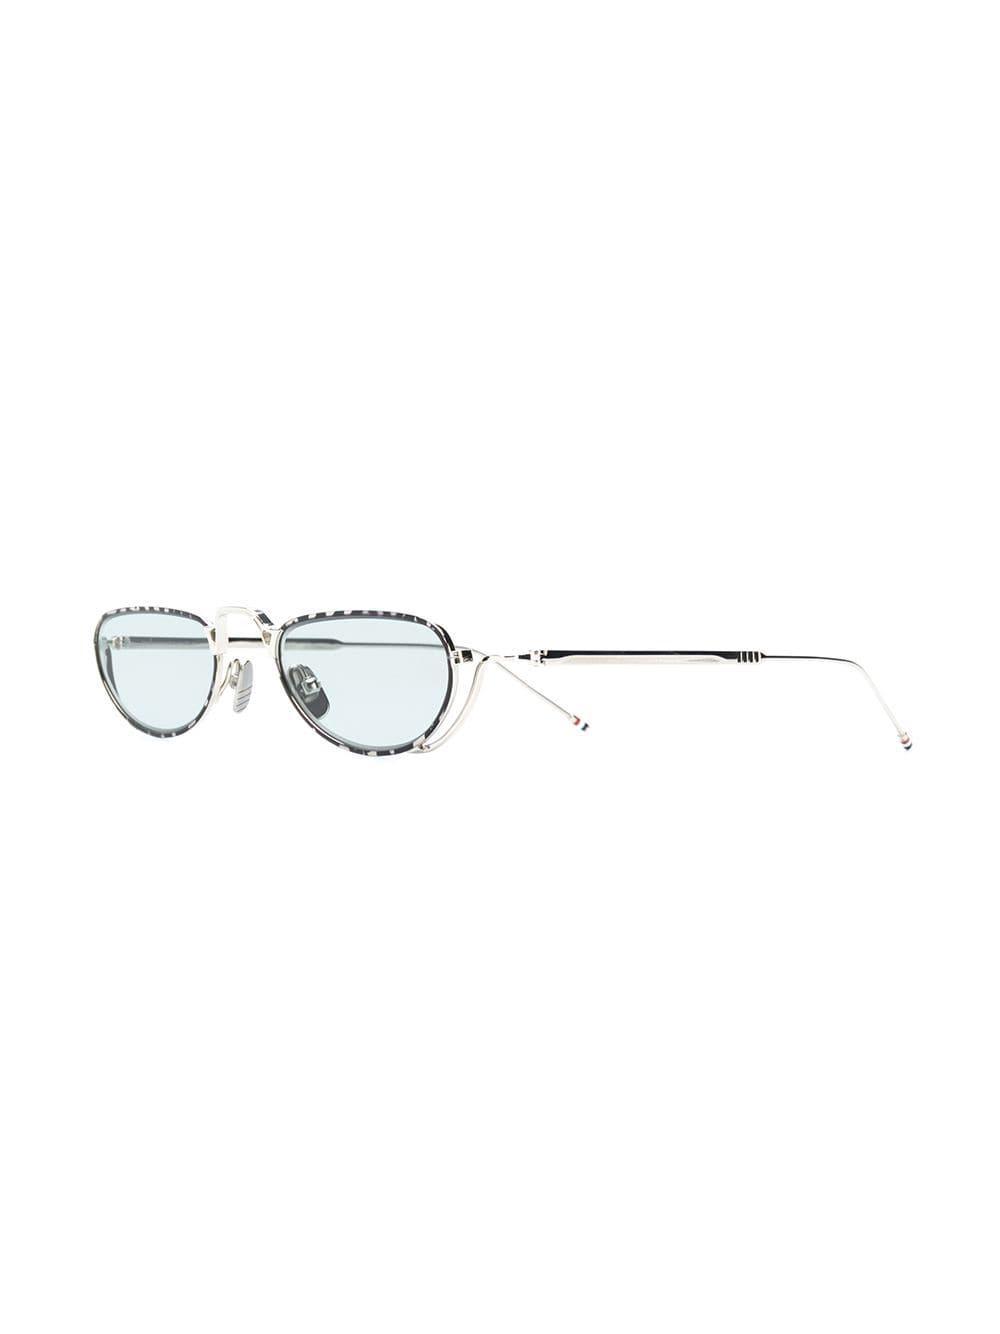 In Silver For Tortoise Lyst Men Metallic Browne Grey Sunglasses amp; Thom gZYTwq6